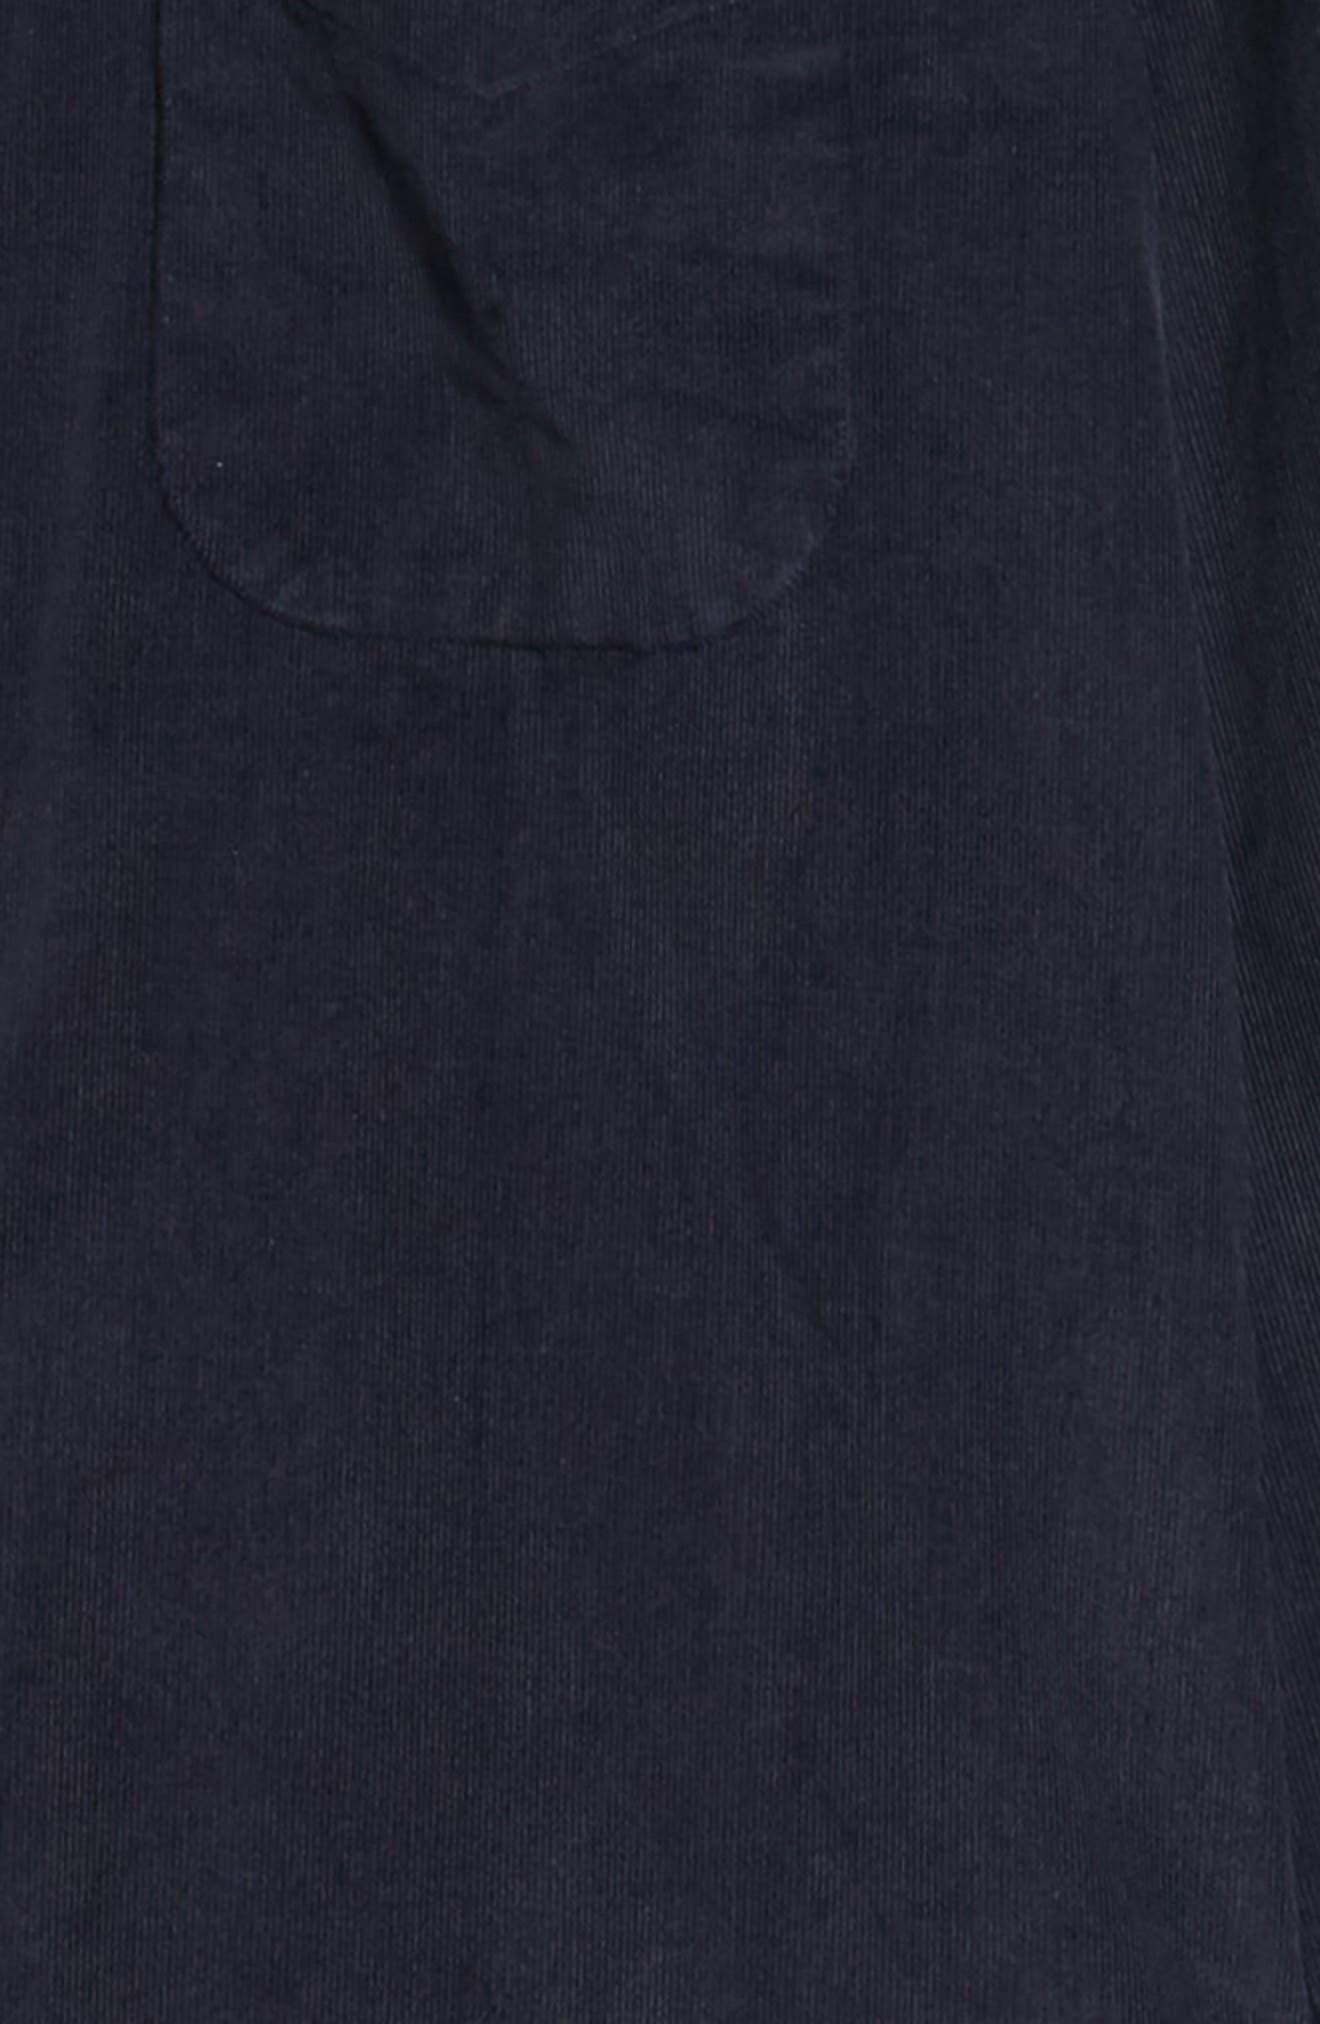 Corduroy Shirt,                             Alternate thumbnail 6, color,                             400